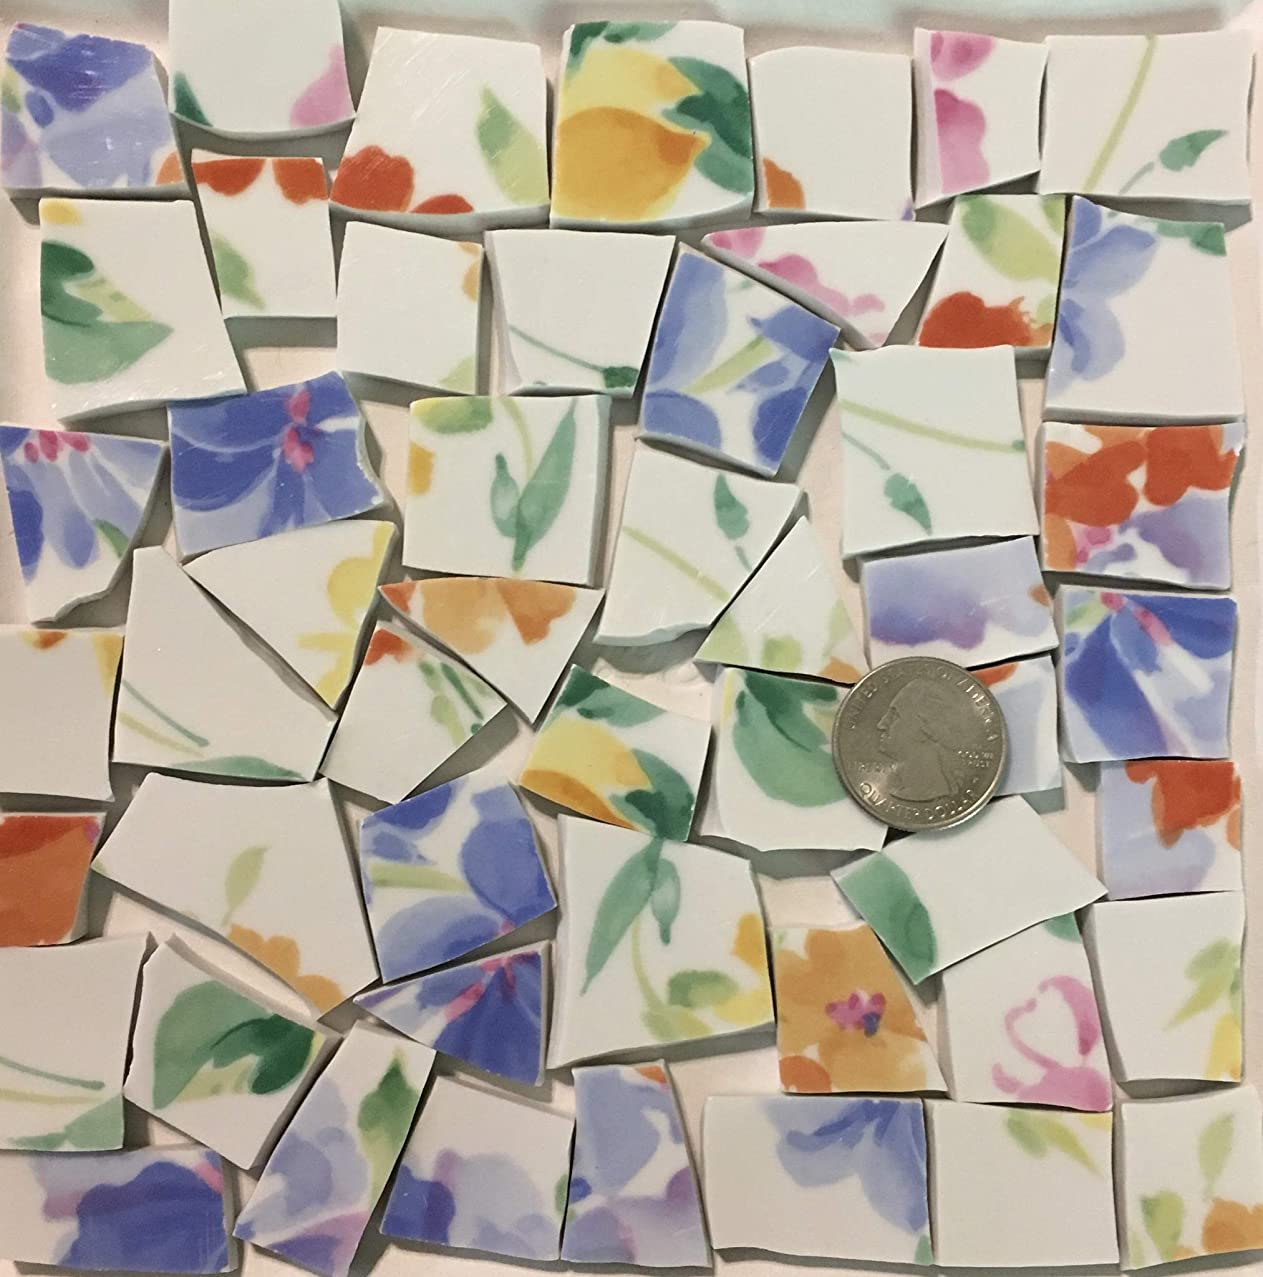 Mosaic Art & Crafts Supply ~ Pale Blue & Green Floral Rim Tiles (B935)